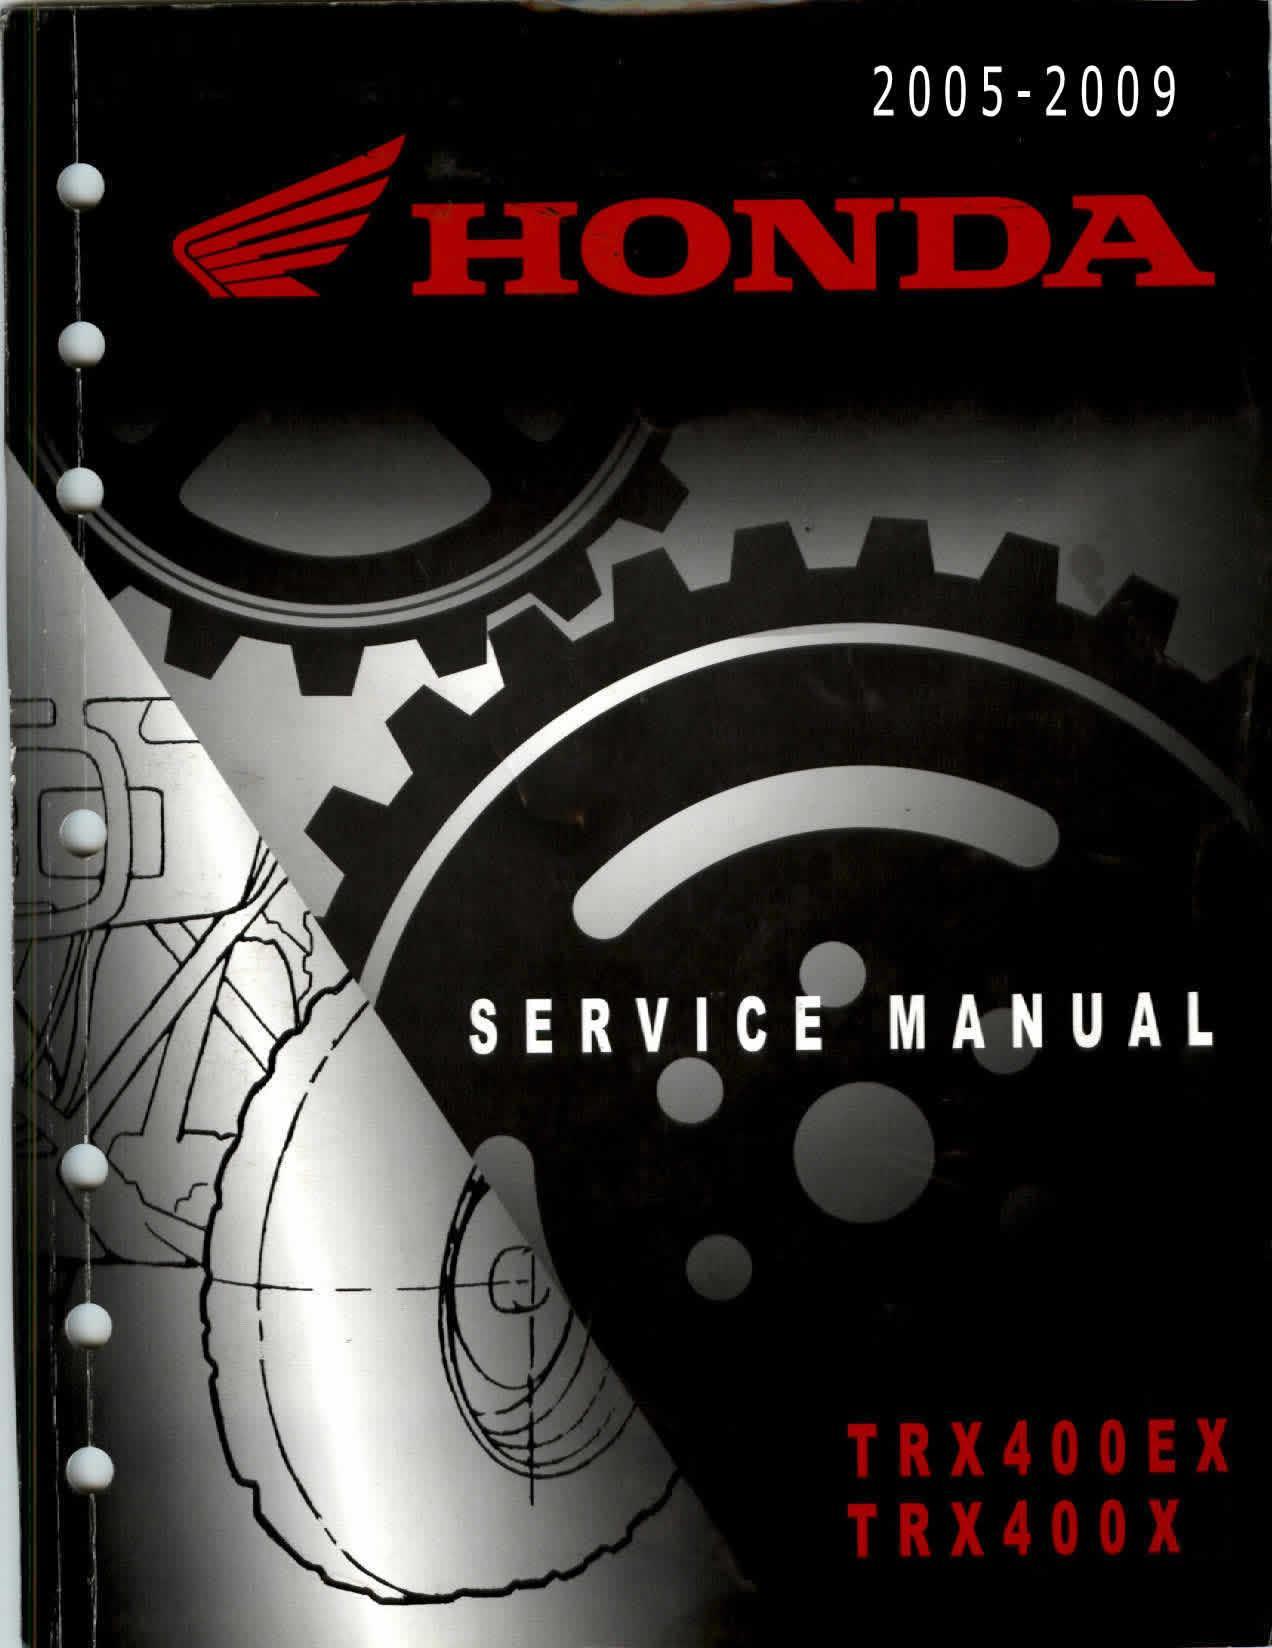 Workshopmanual for Honda TRX400EX (2005-2009)